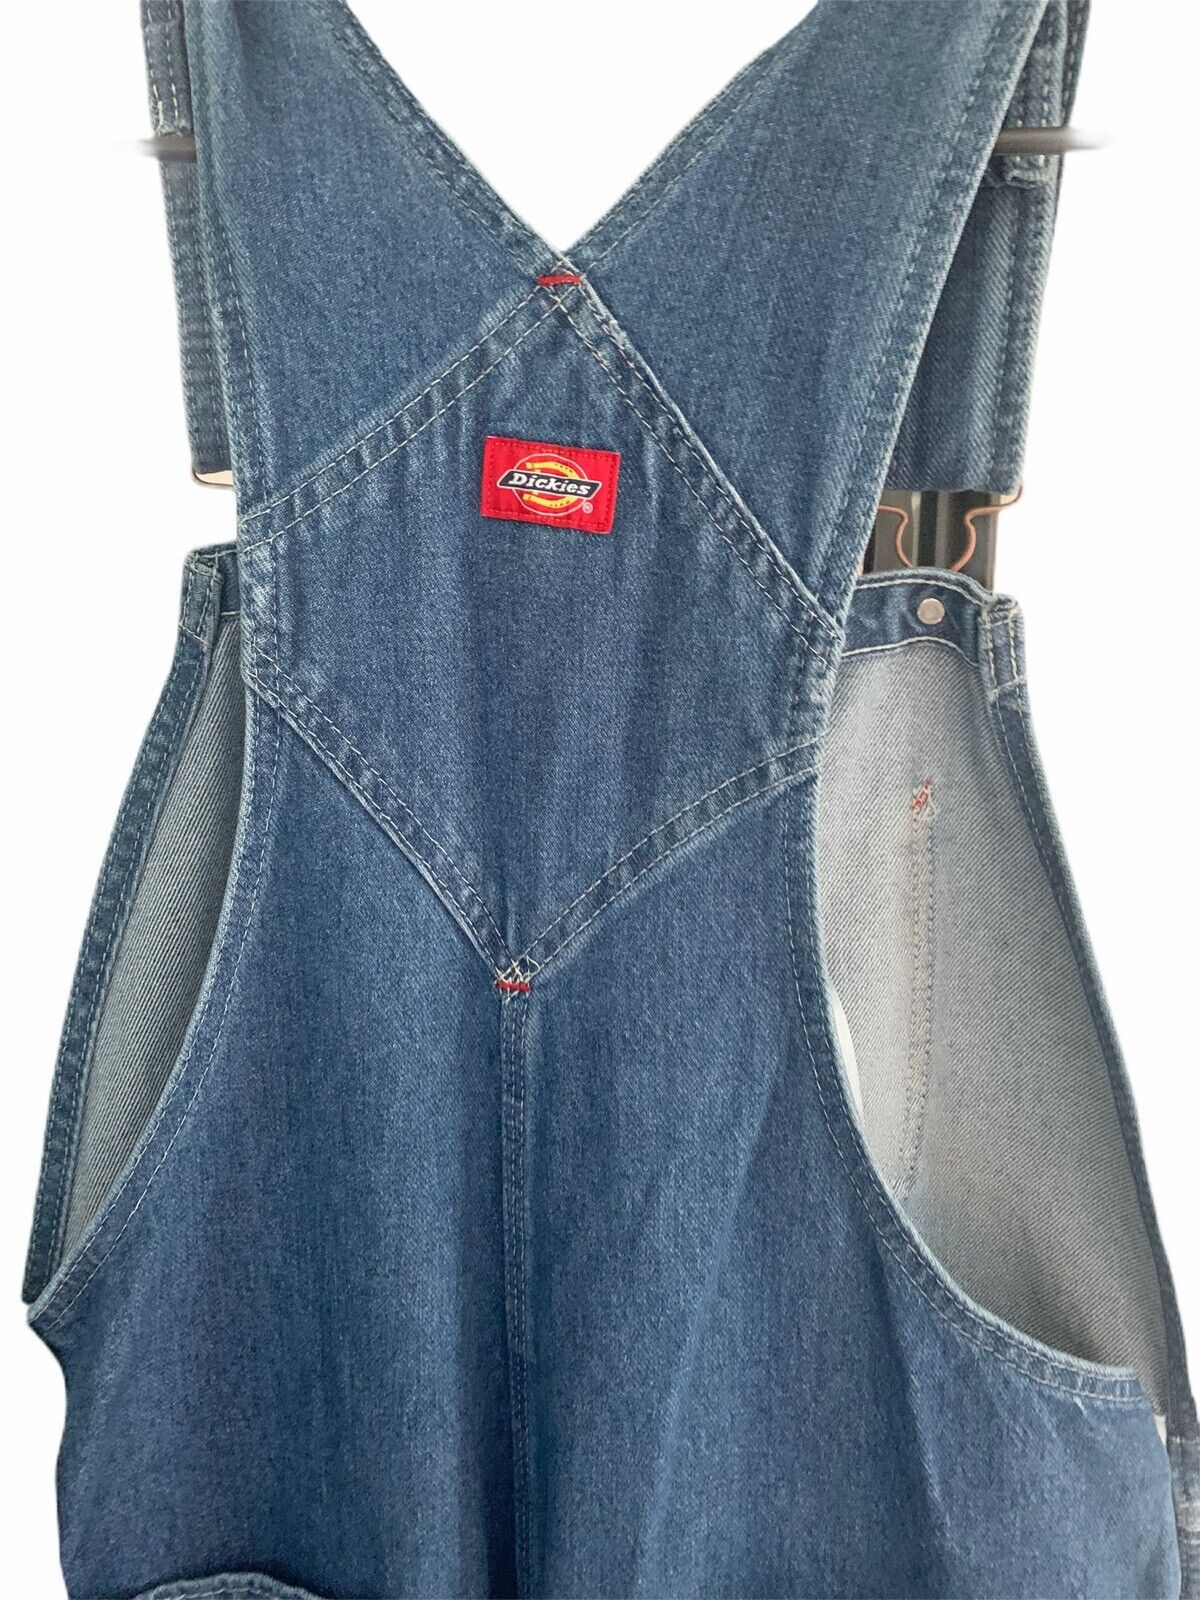 dickies overalls mens - image 5